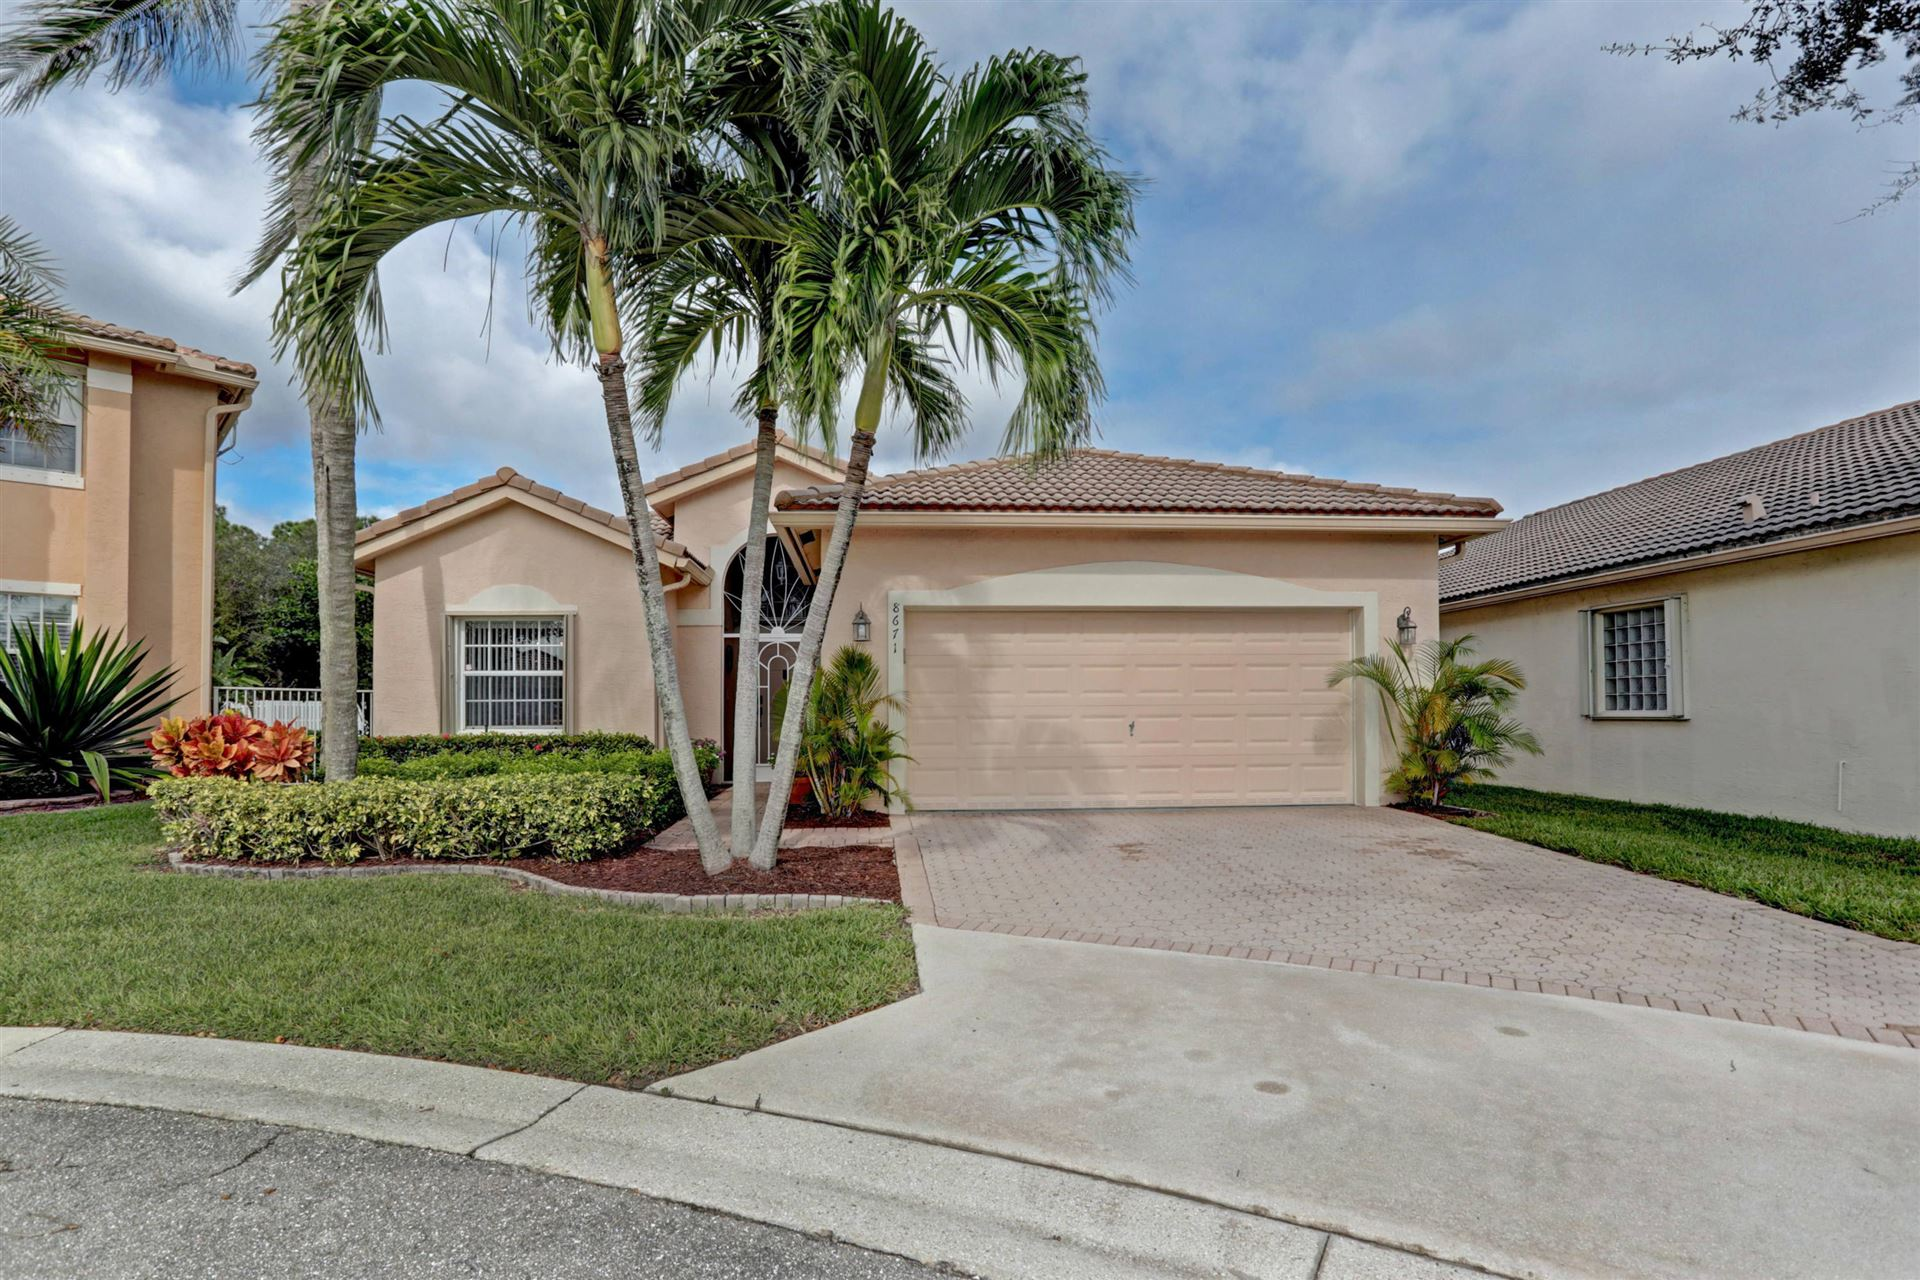 8671 Gold Cay, West Palm Beach, FL 33411 - #: RX-10673206